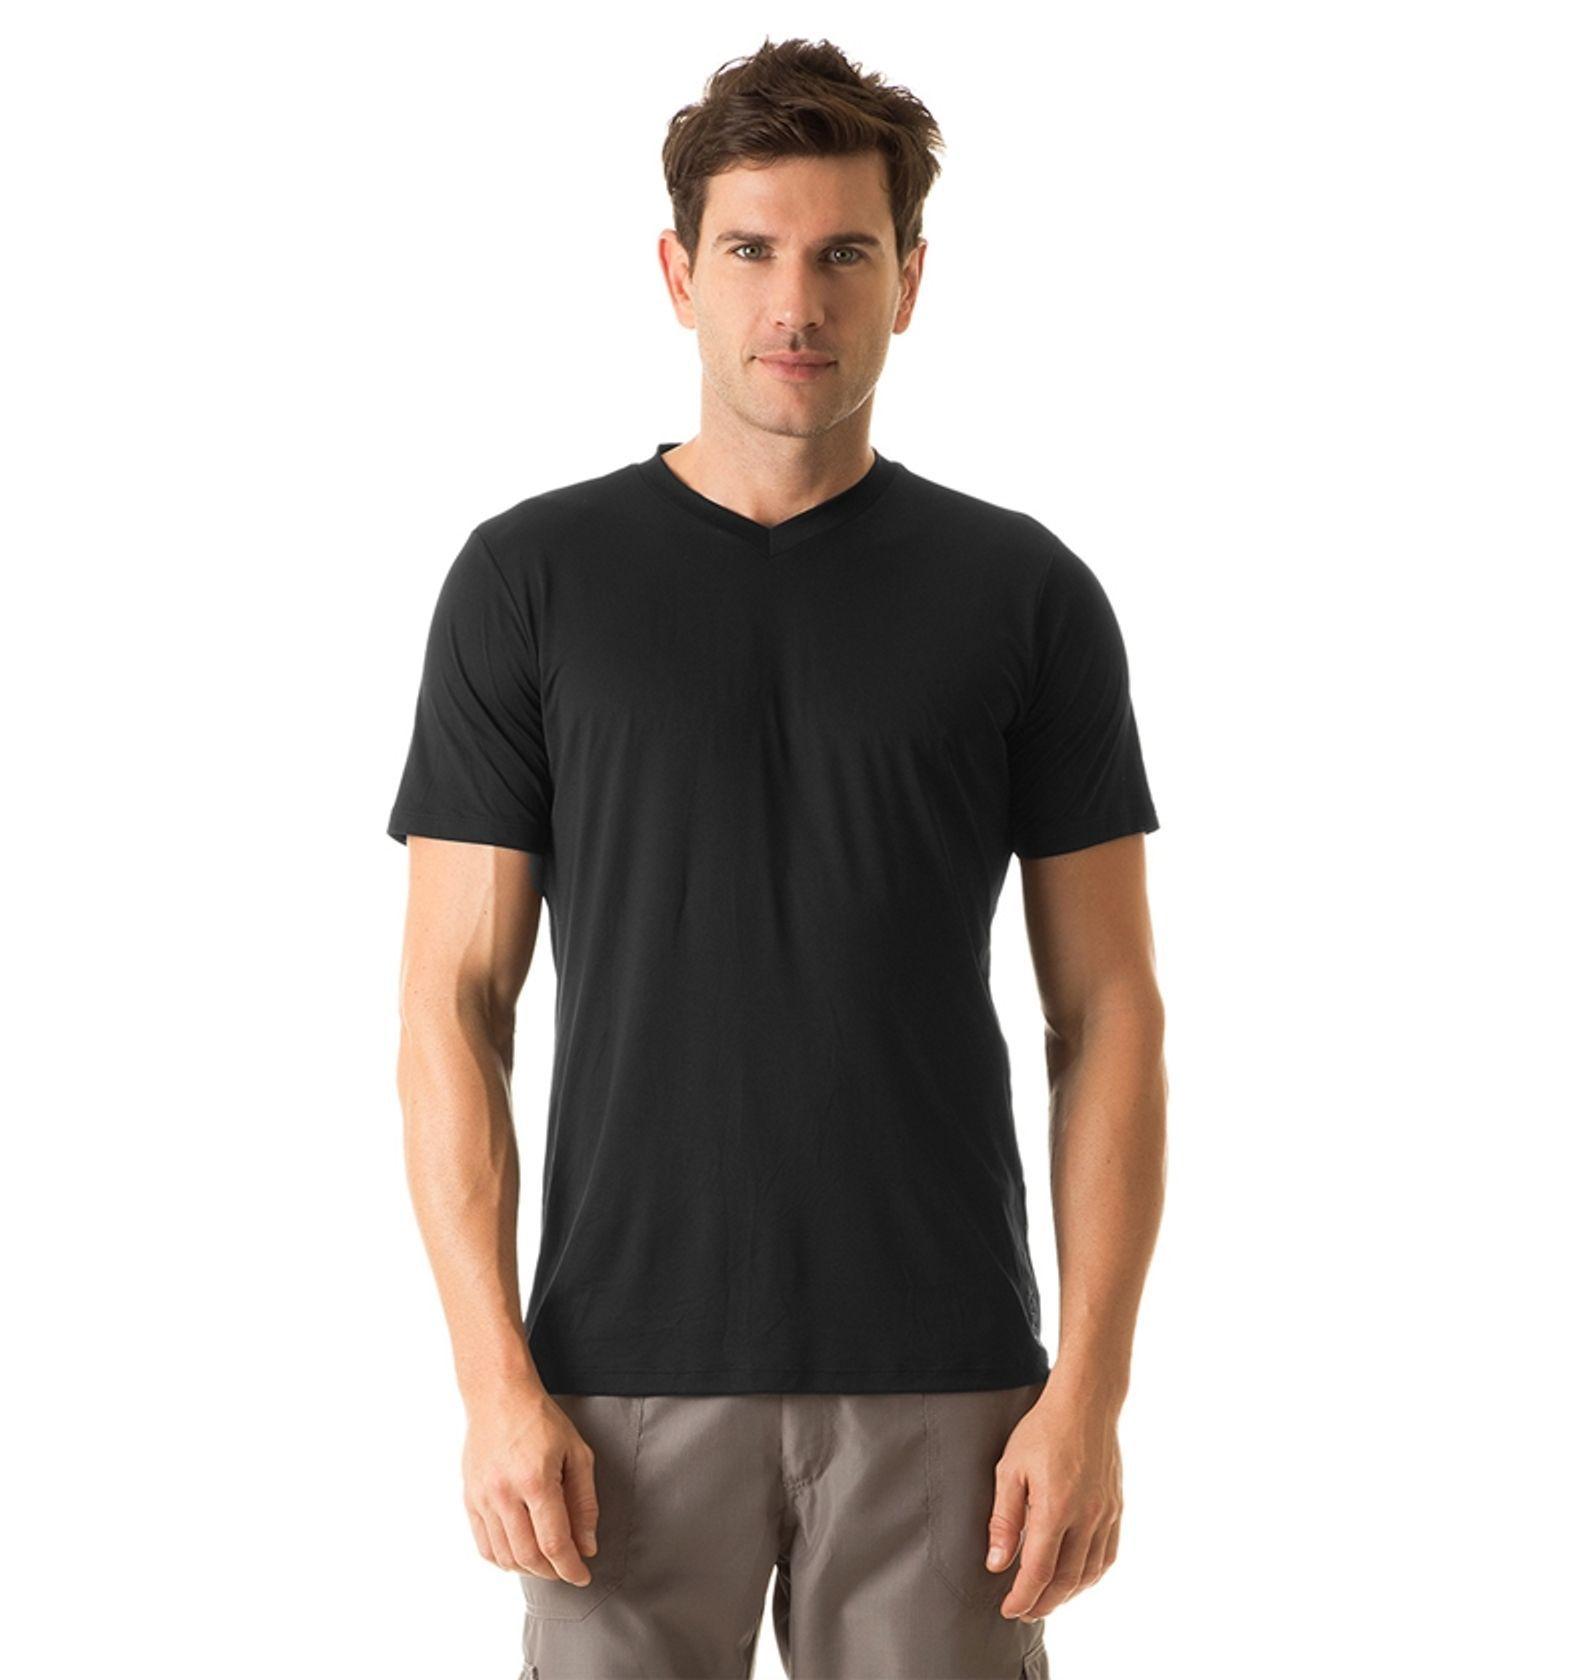 UV LINE Camiseta Masculina Manga Curta Sport Fit Lisa Proteção Solar